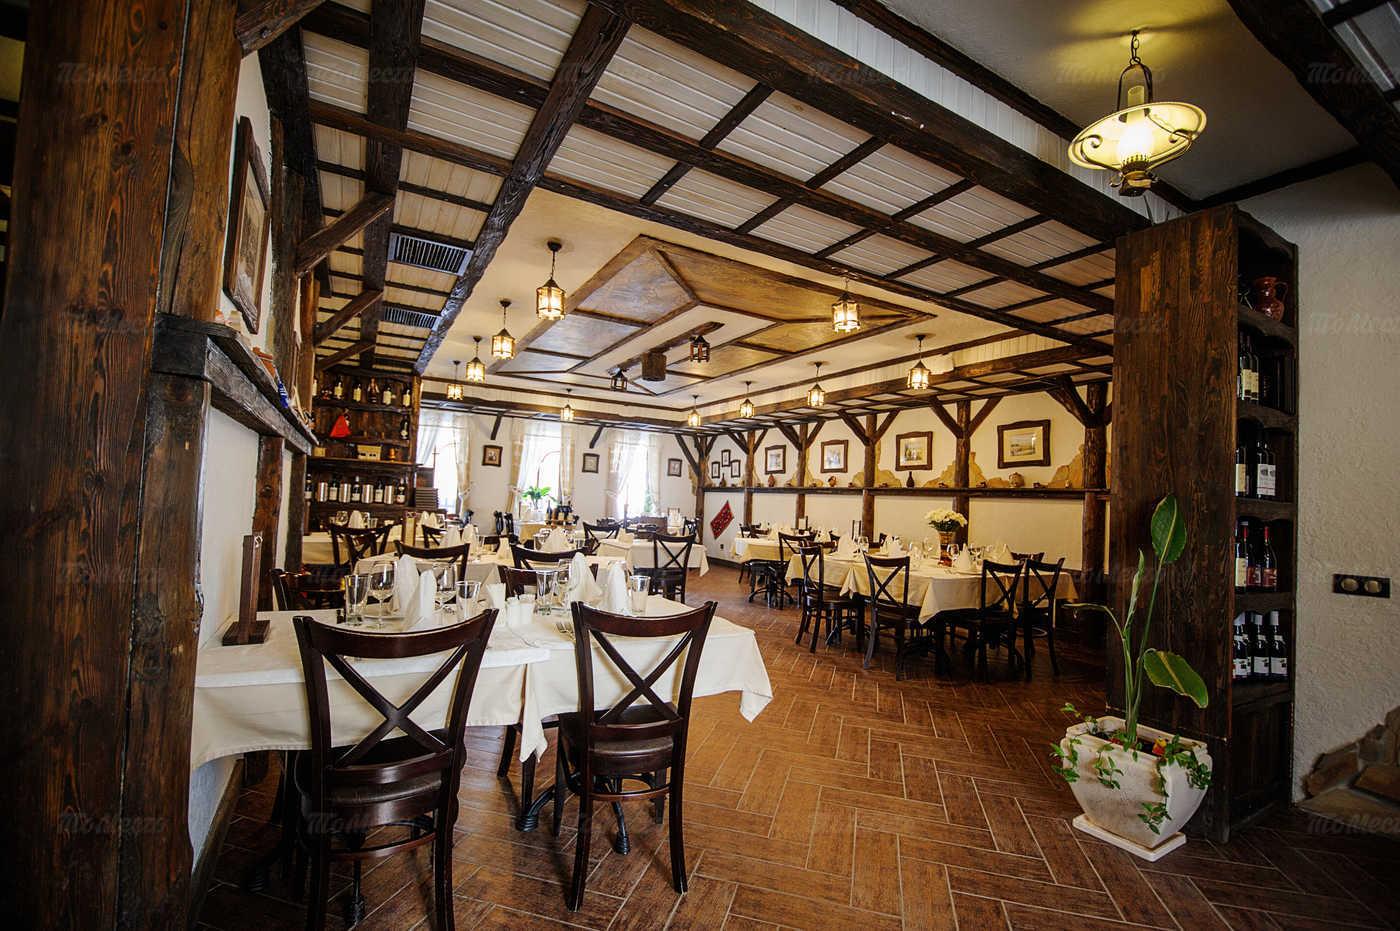 Ресторан Златибор на Пермской улице фото 4